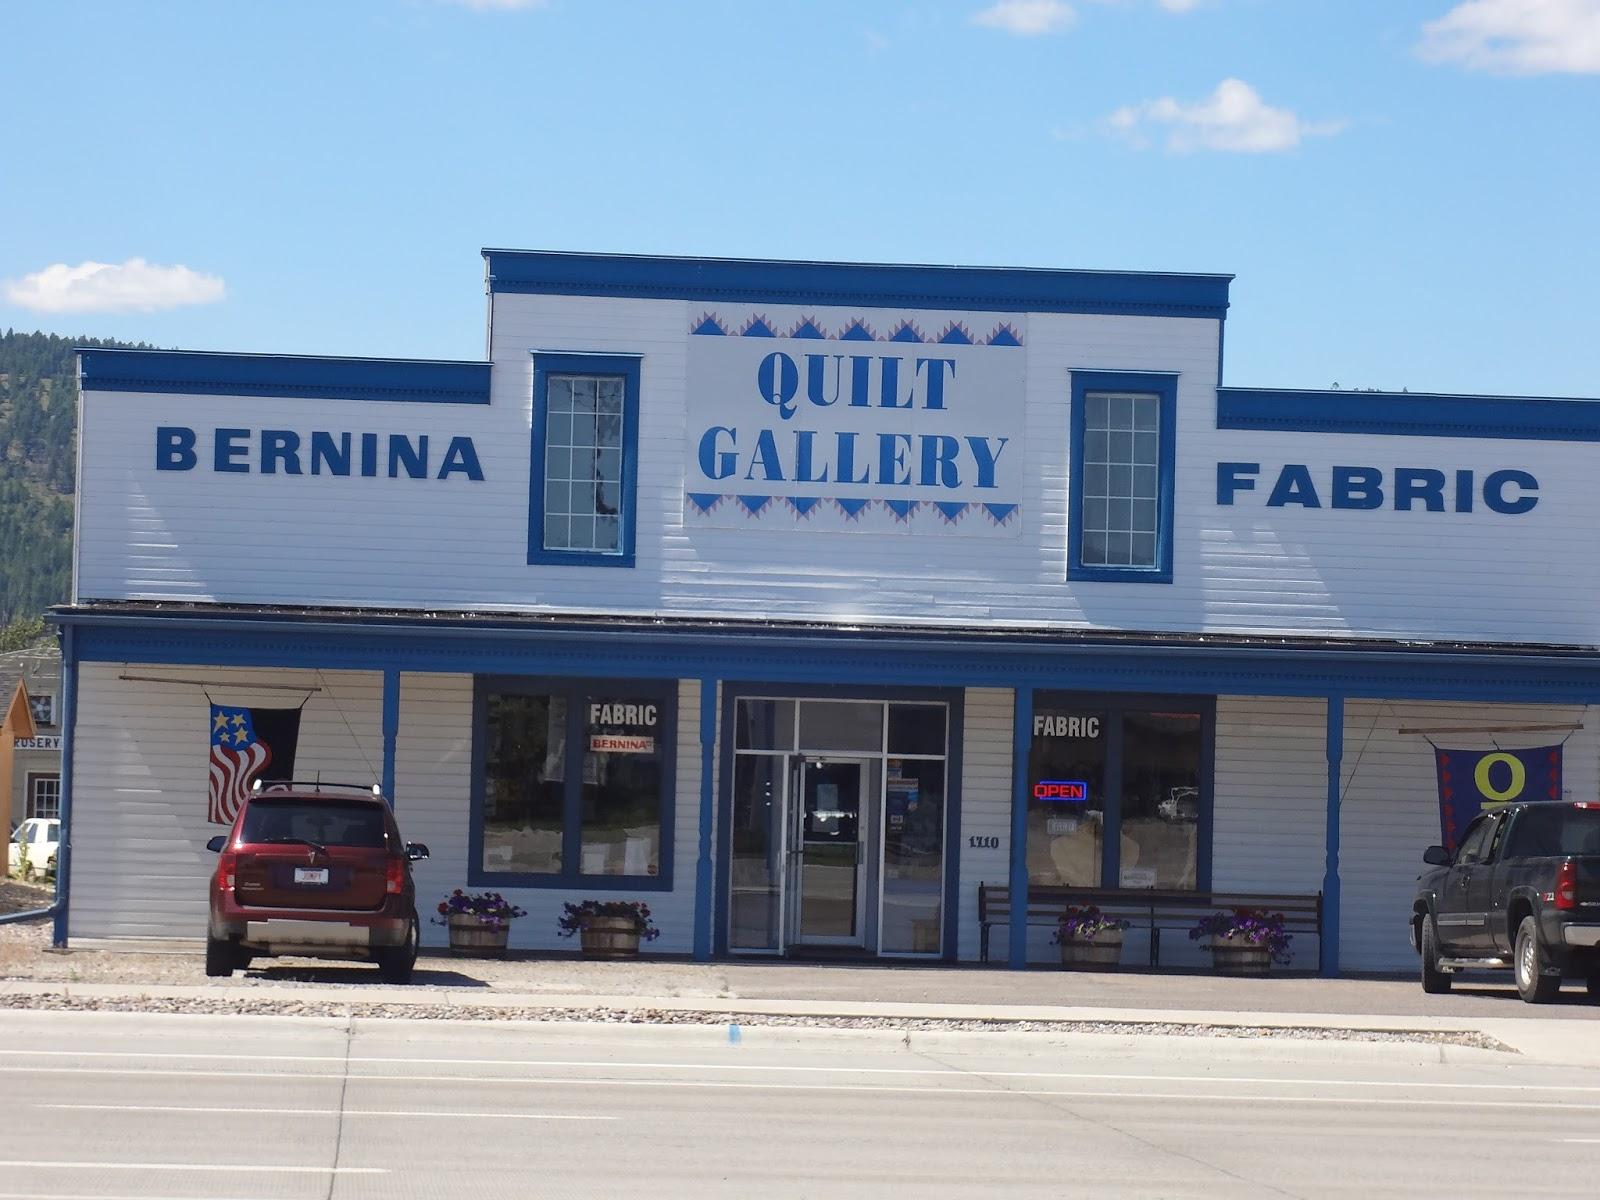 Weyburn Crocus Quilters: Visiting Quilt Shops in MT : quilt shops in montana - Adamdwight.com